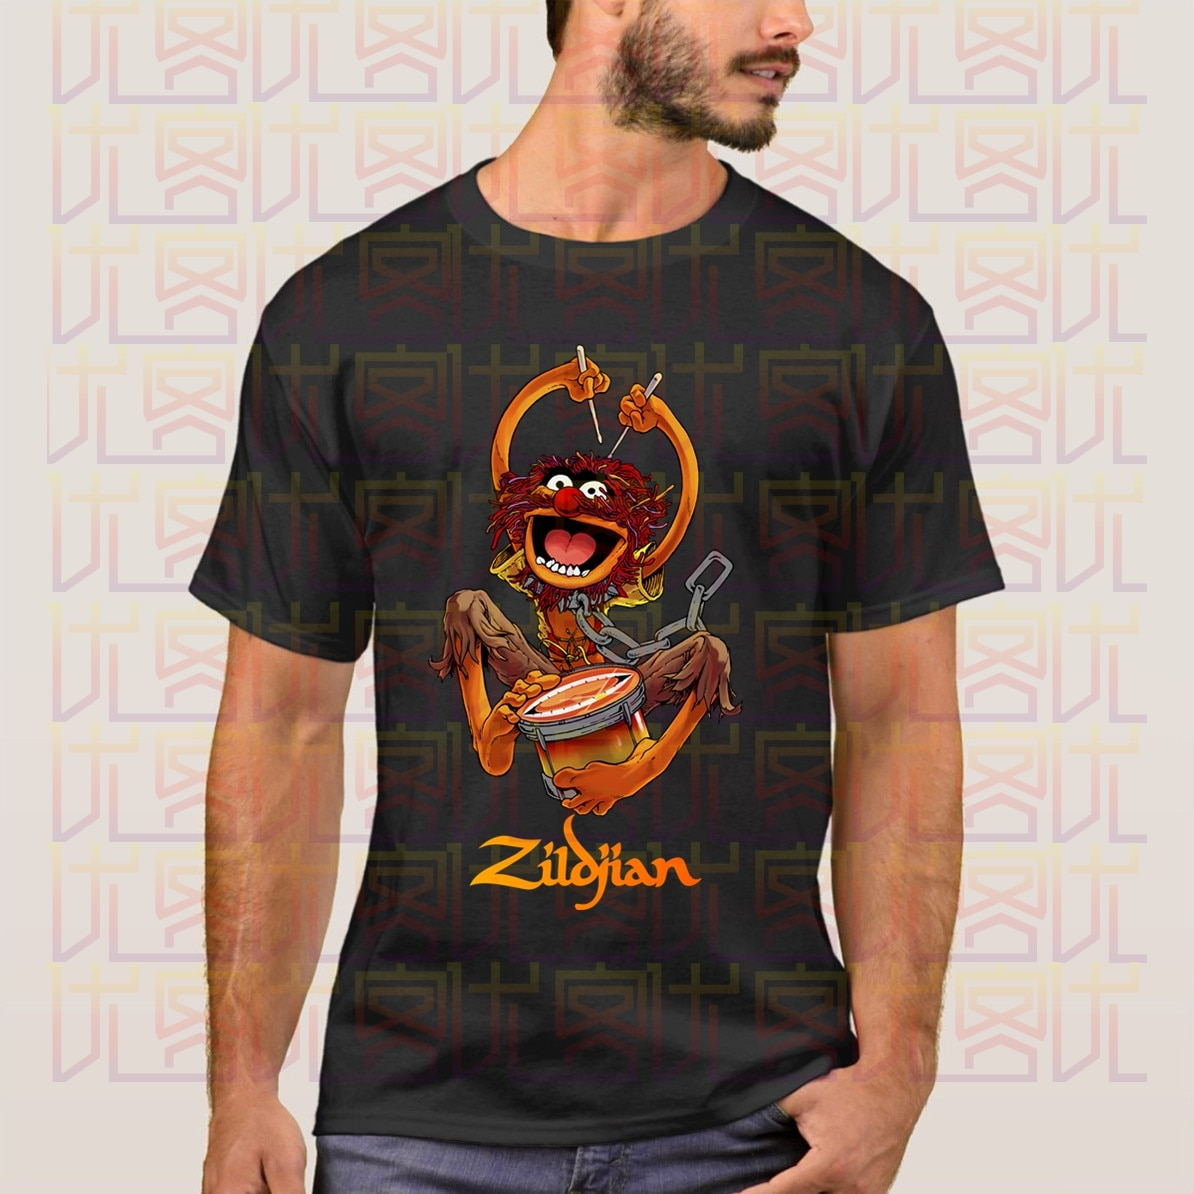 Avedis Zildjian 세서미 스트리트 Muppet 드럼 드러머 매니아 티셔츠 2020 남성용 반소매 티셔츠